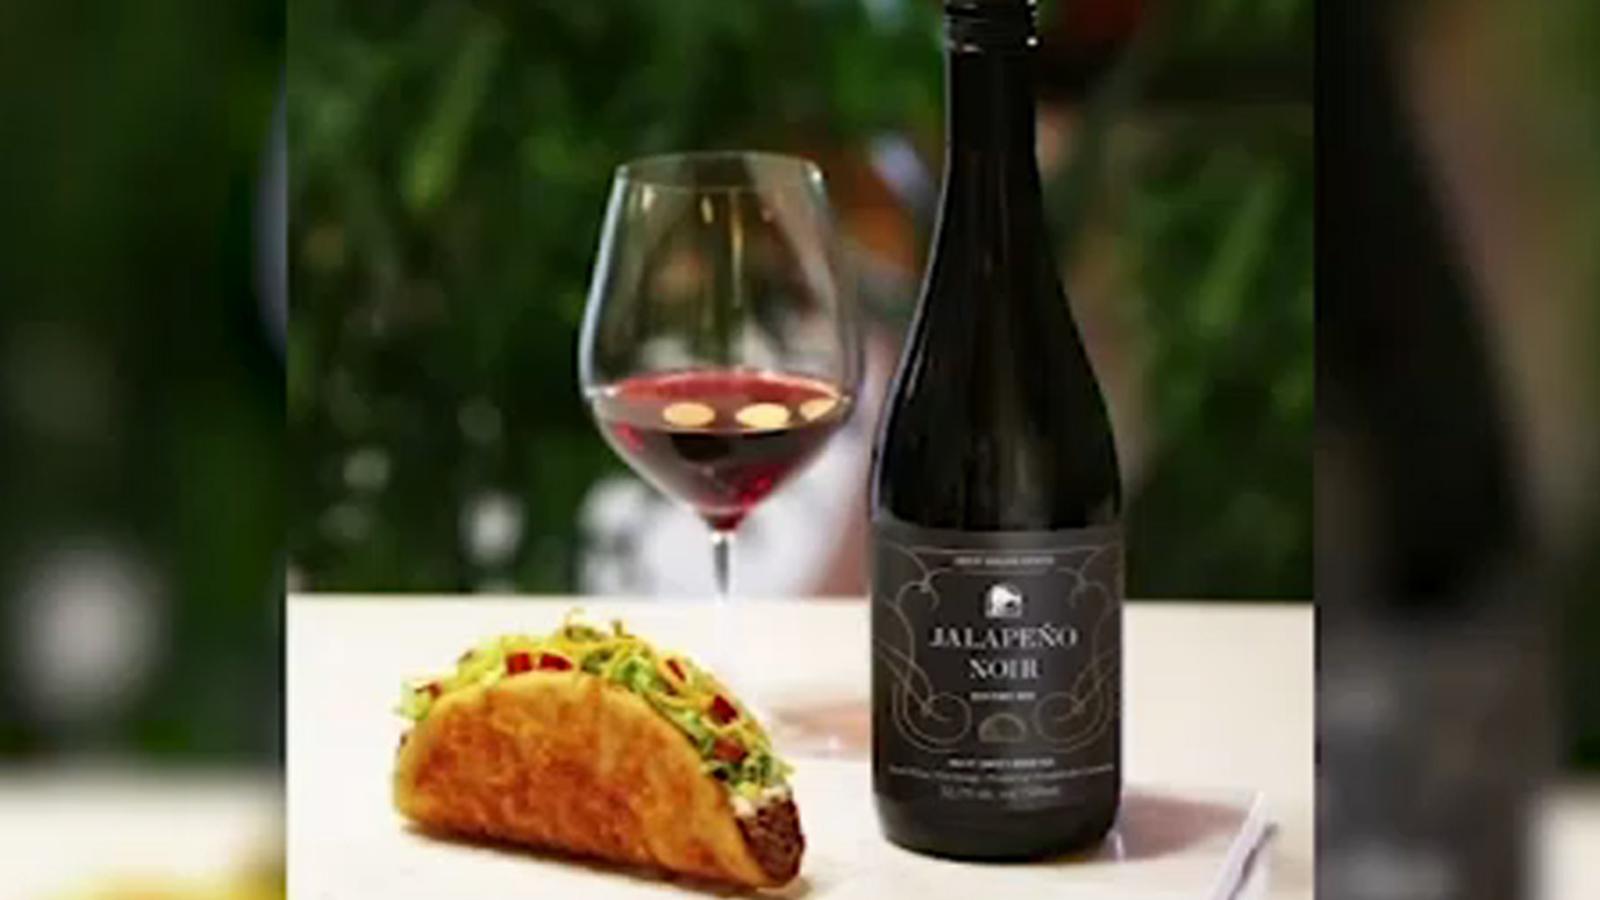 Taco Bell introduces Jalapeno Noir to its menu